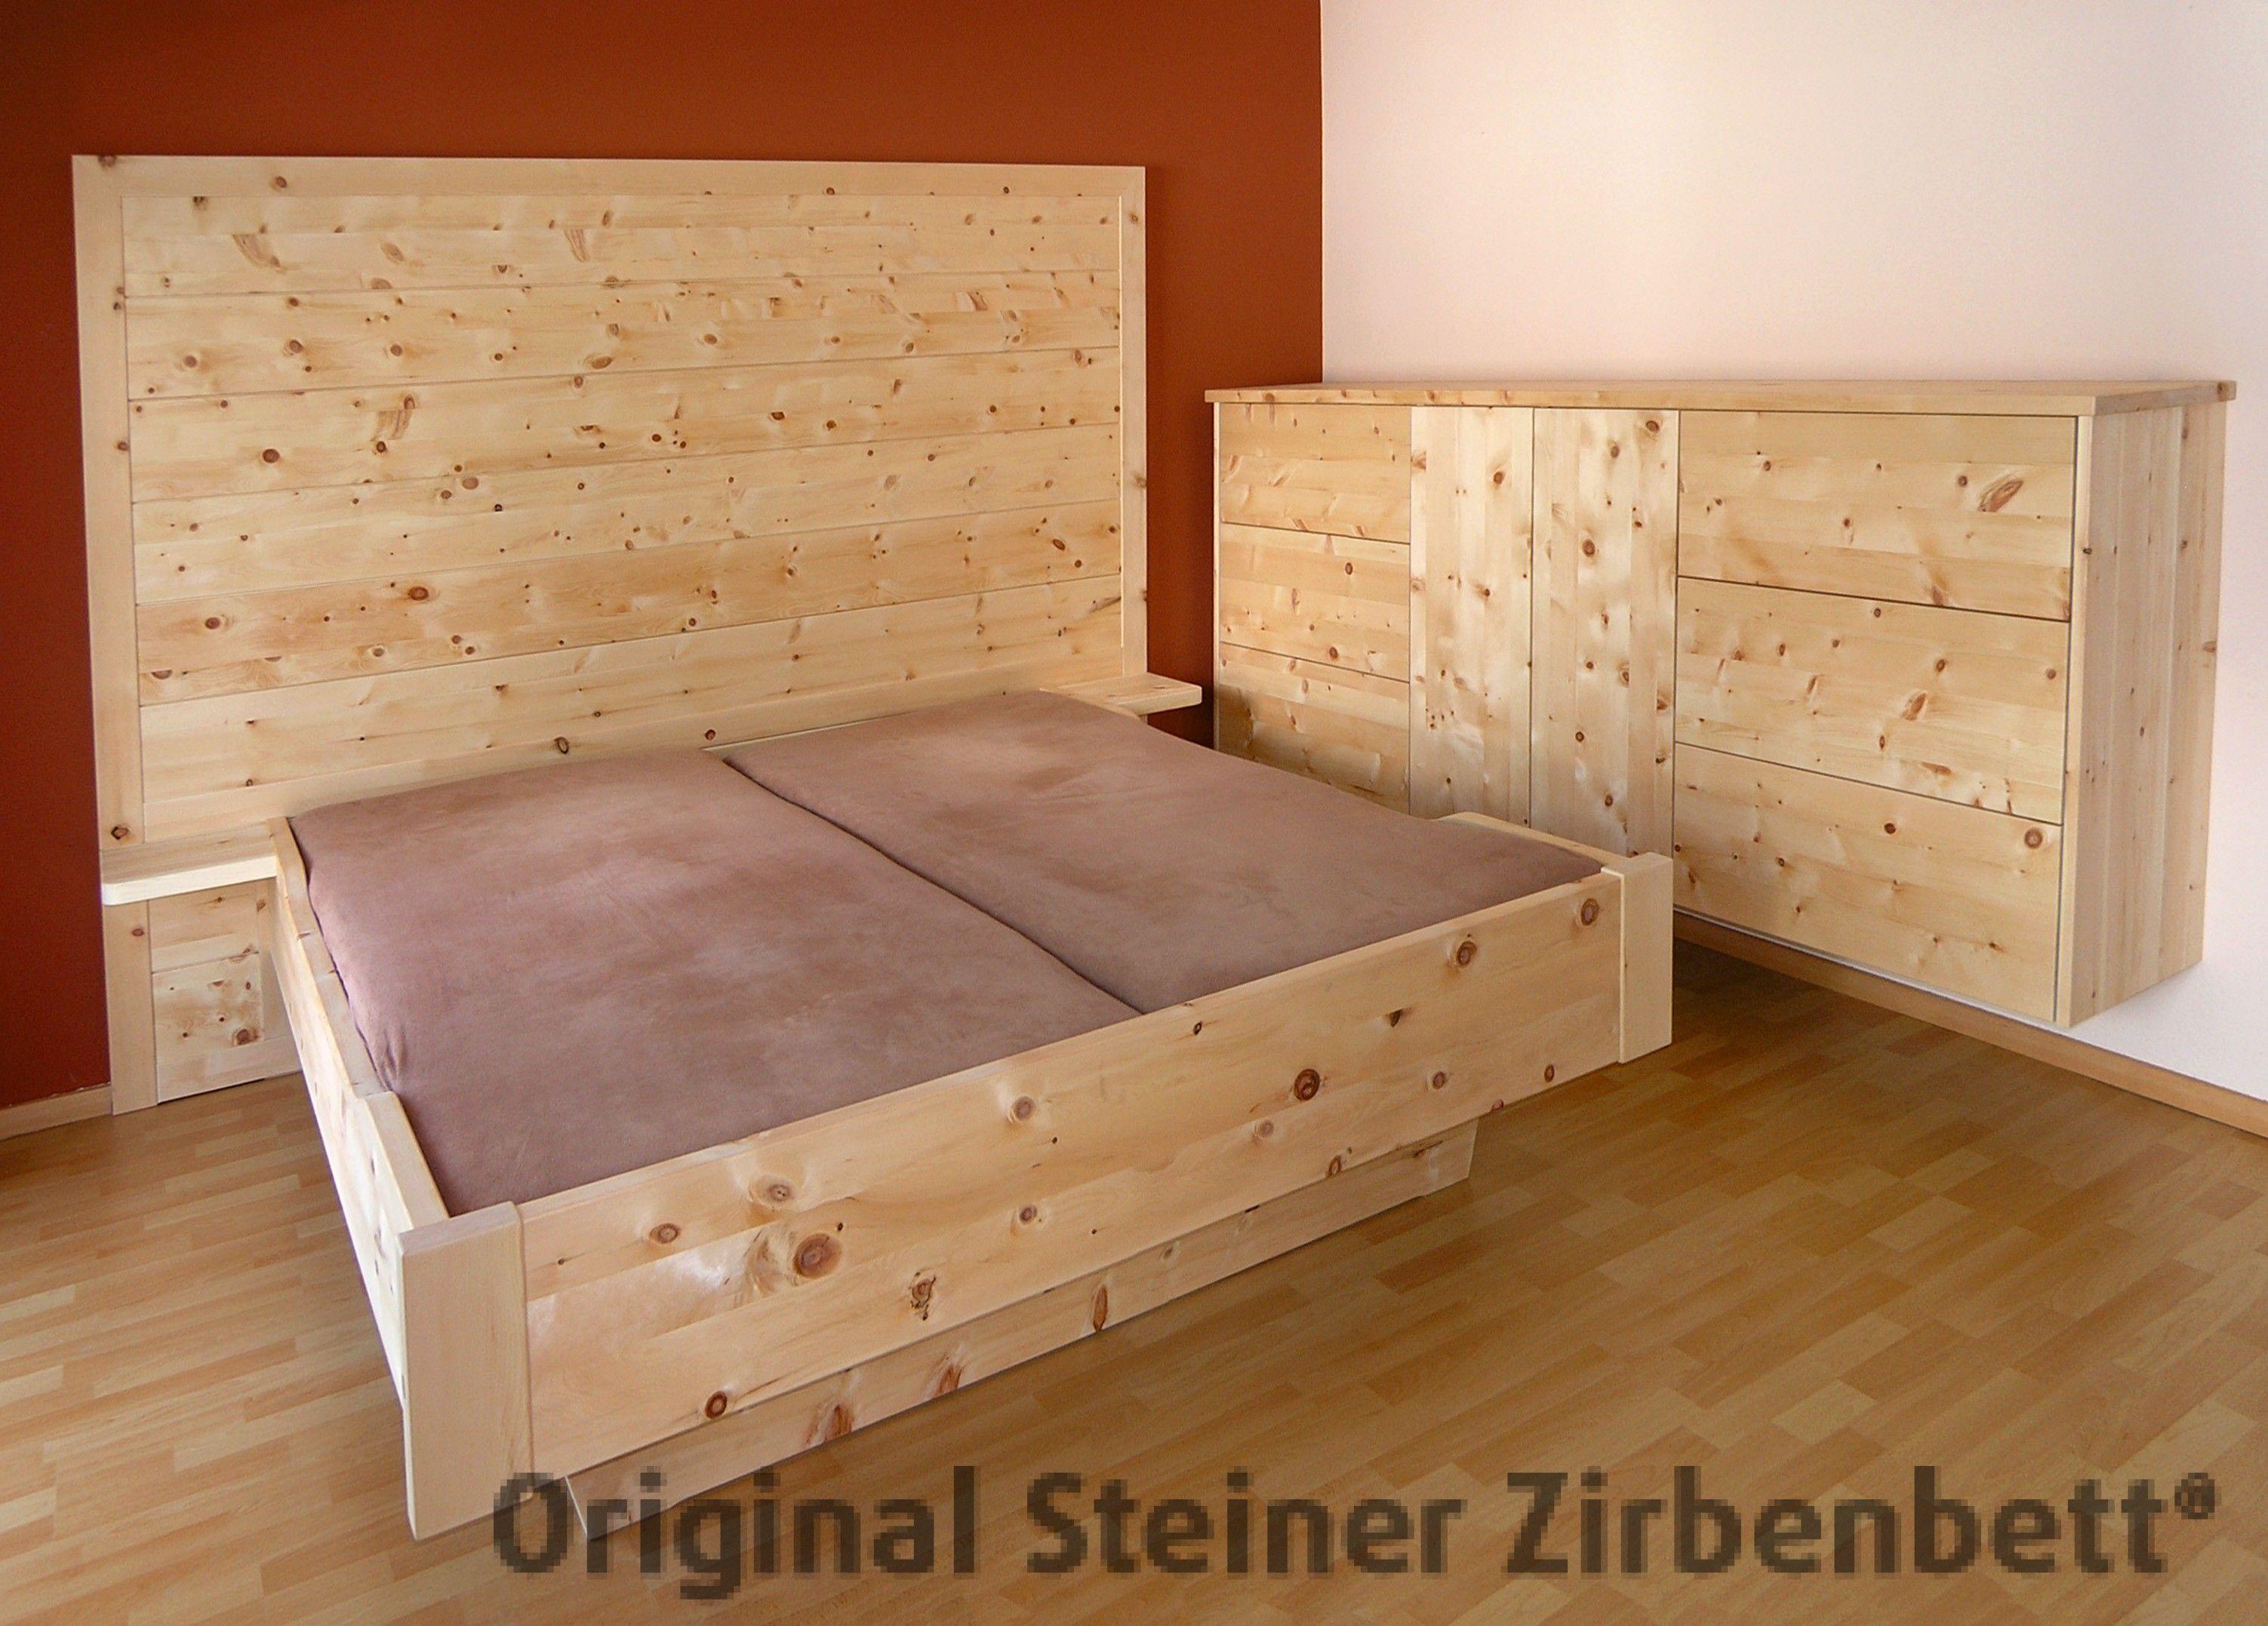 zirbenbett watzmann doppelbett massivholzbett | zirbenbett, Schlafzimmer entwurf